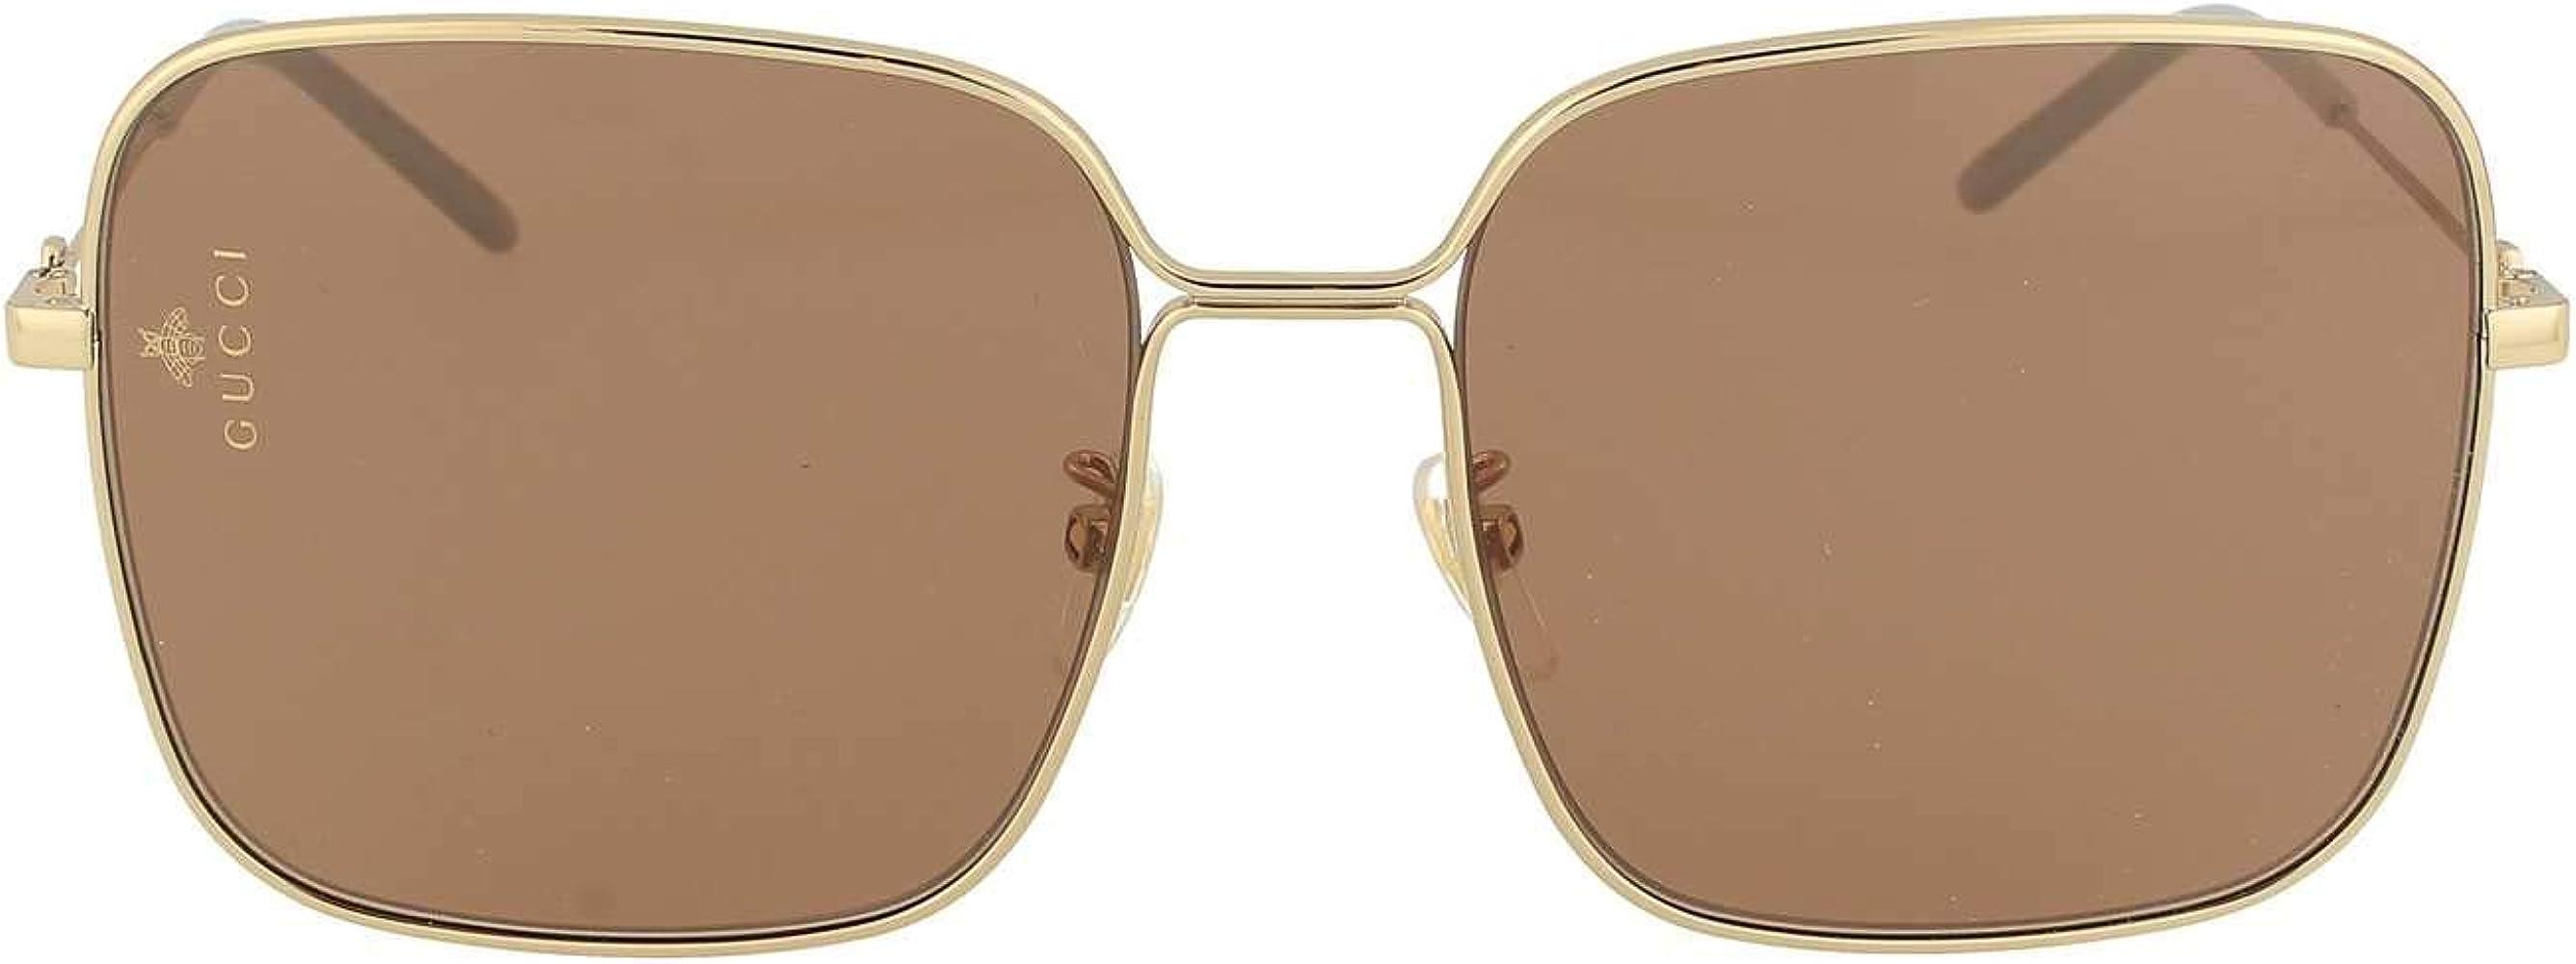 Amazon.com: Gucci GG0443S 002 Gold GG0443S - Gafas de sol ...